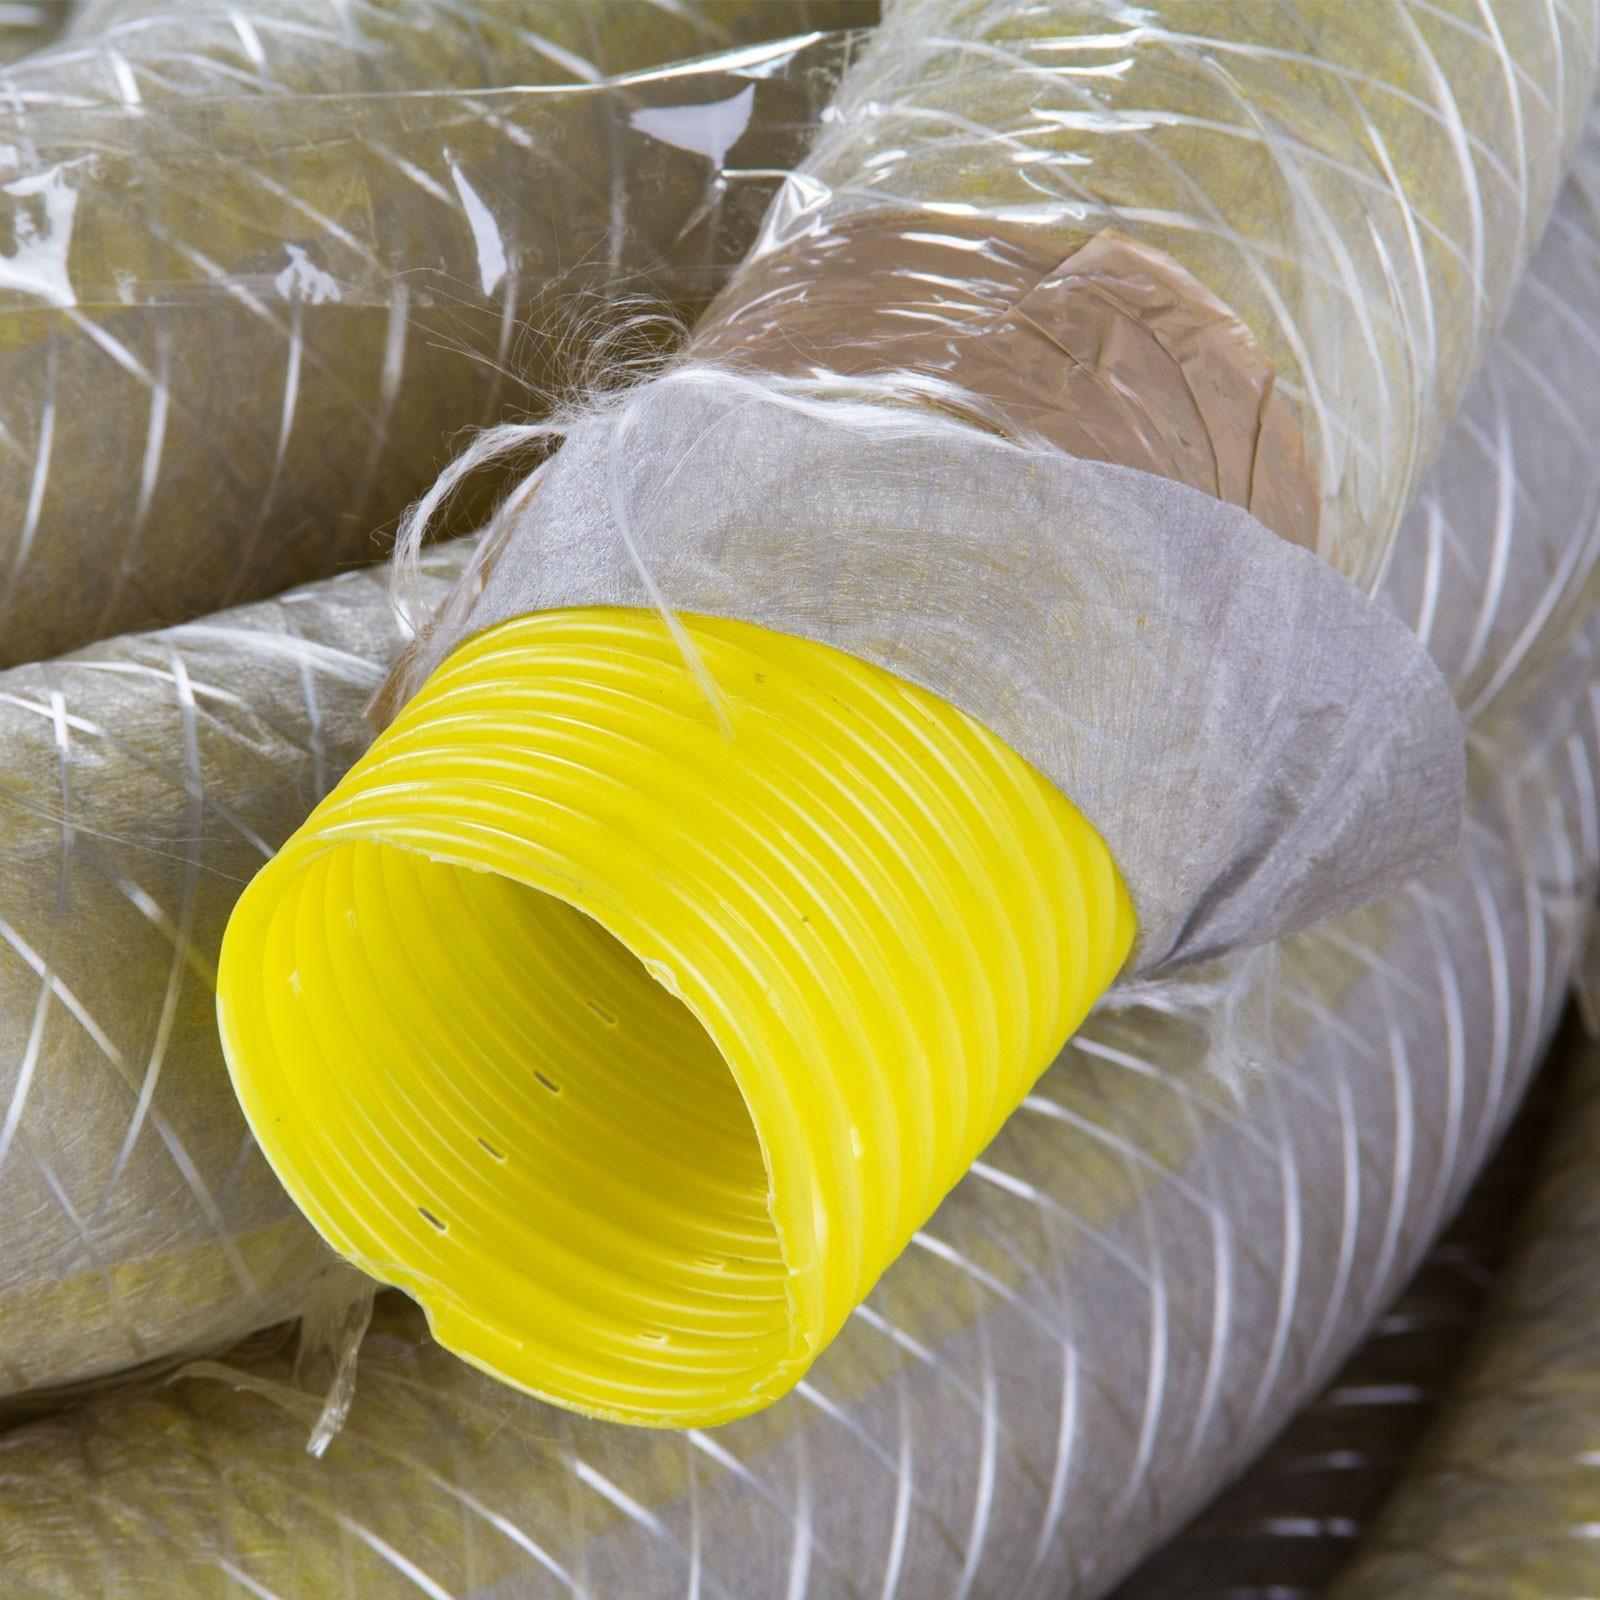 drainagerohr drainageschlauch dn80 50m mit vlies filter. Black Bedroom Furniture Sets. Home Design Ideas